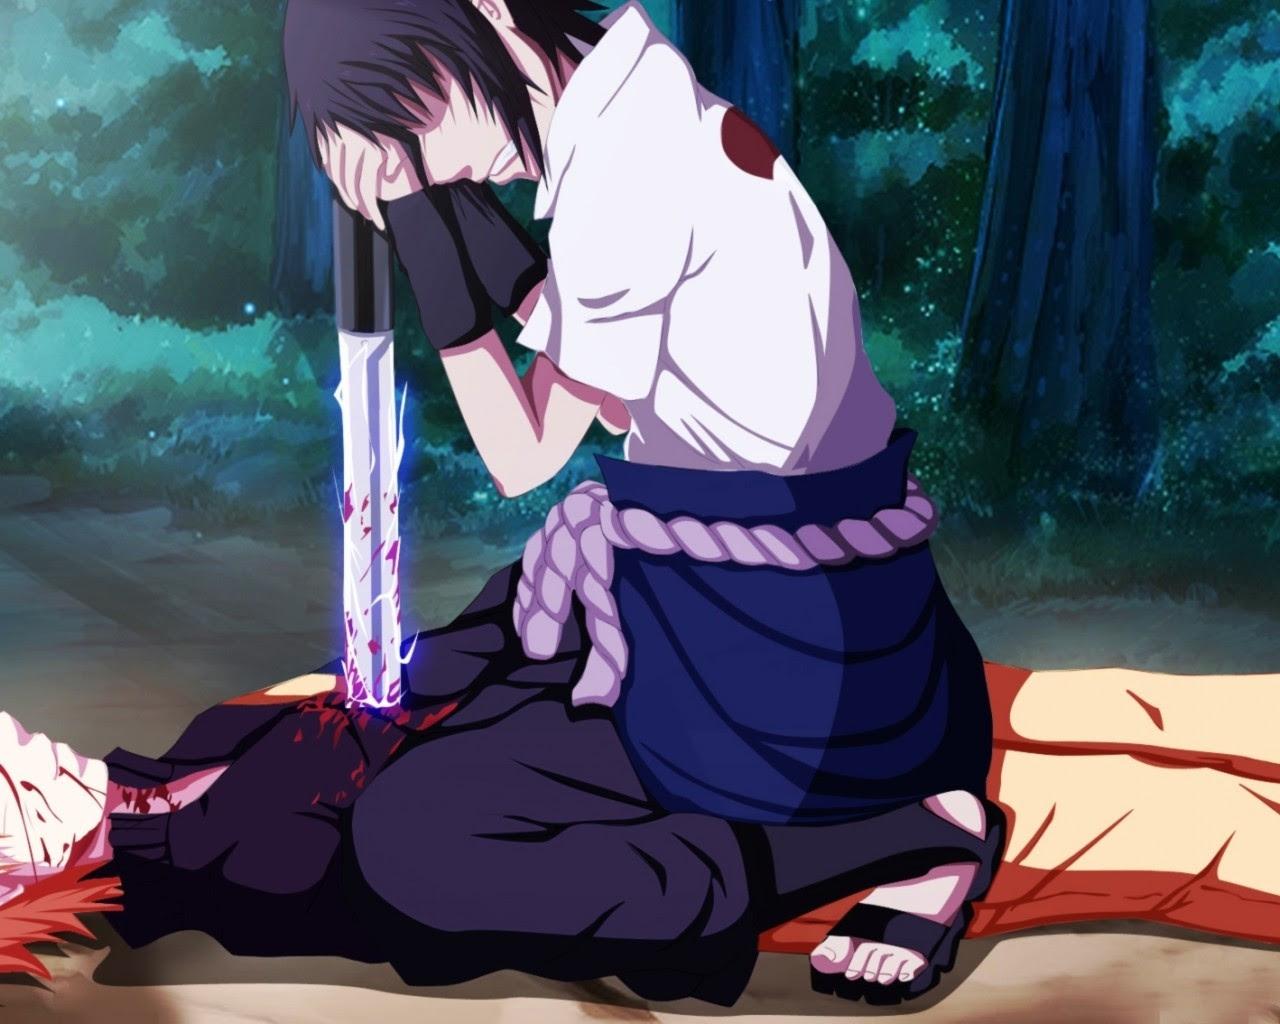 Sasuke Uchiha And Naruto ナルト Uzumaki うちはサスケ 壁紙